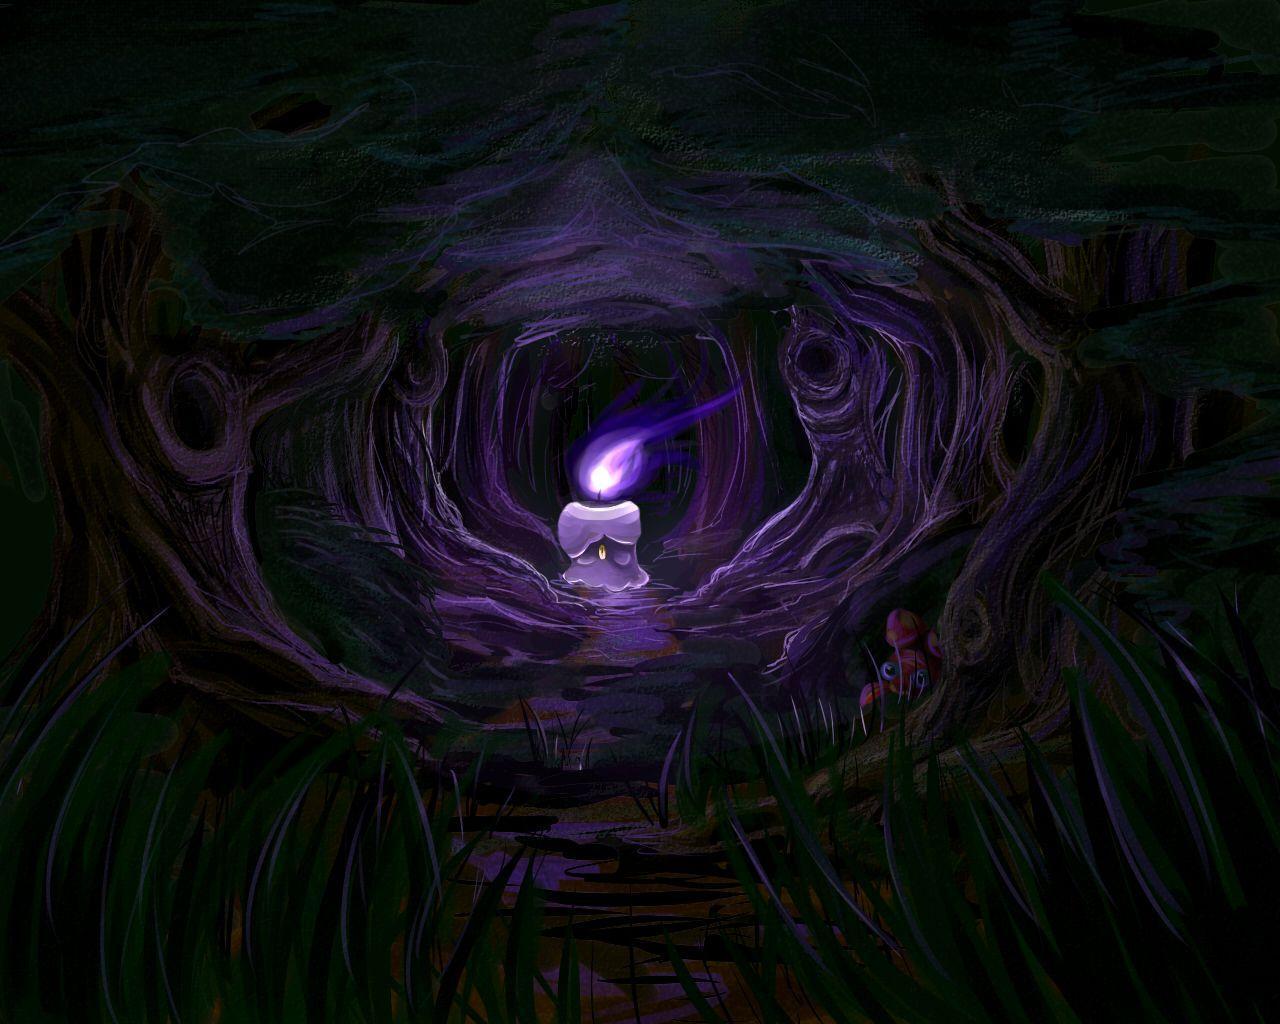 Ghost pok mon wallpapers wallpaper cave - Pokemon ghost wallpaper ...